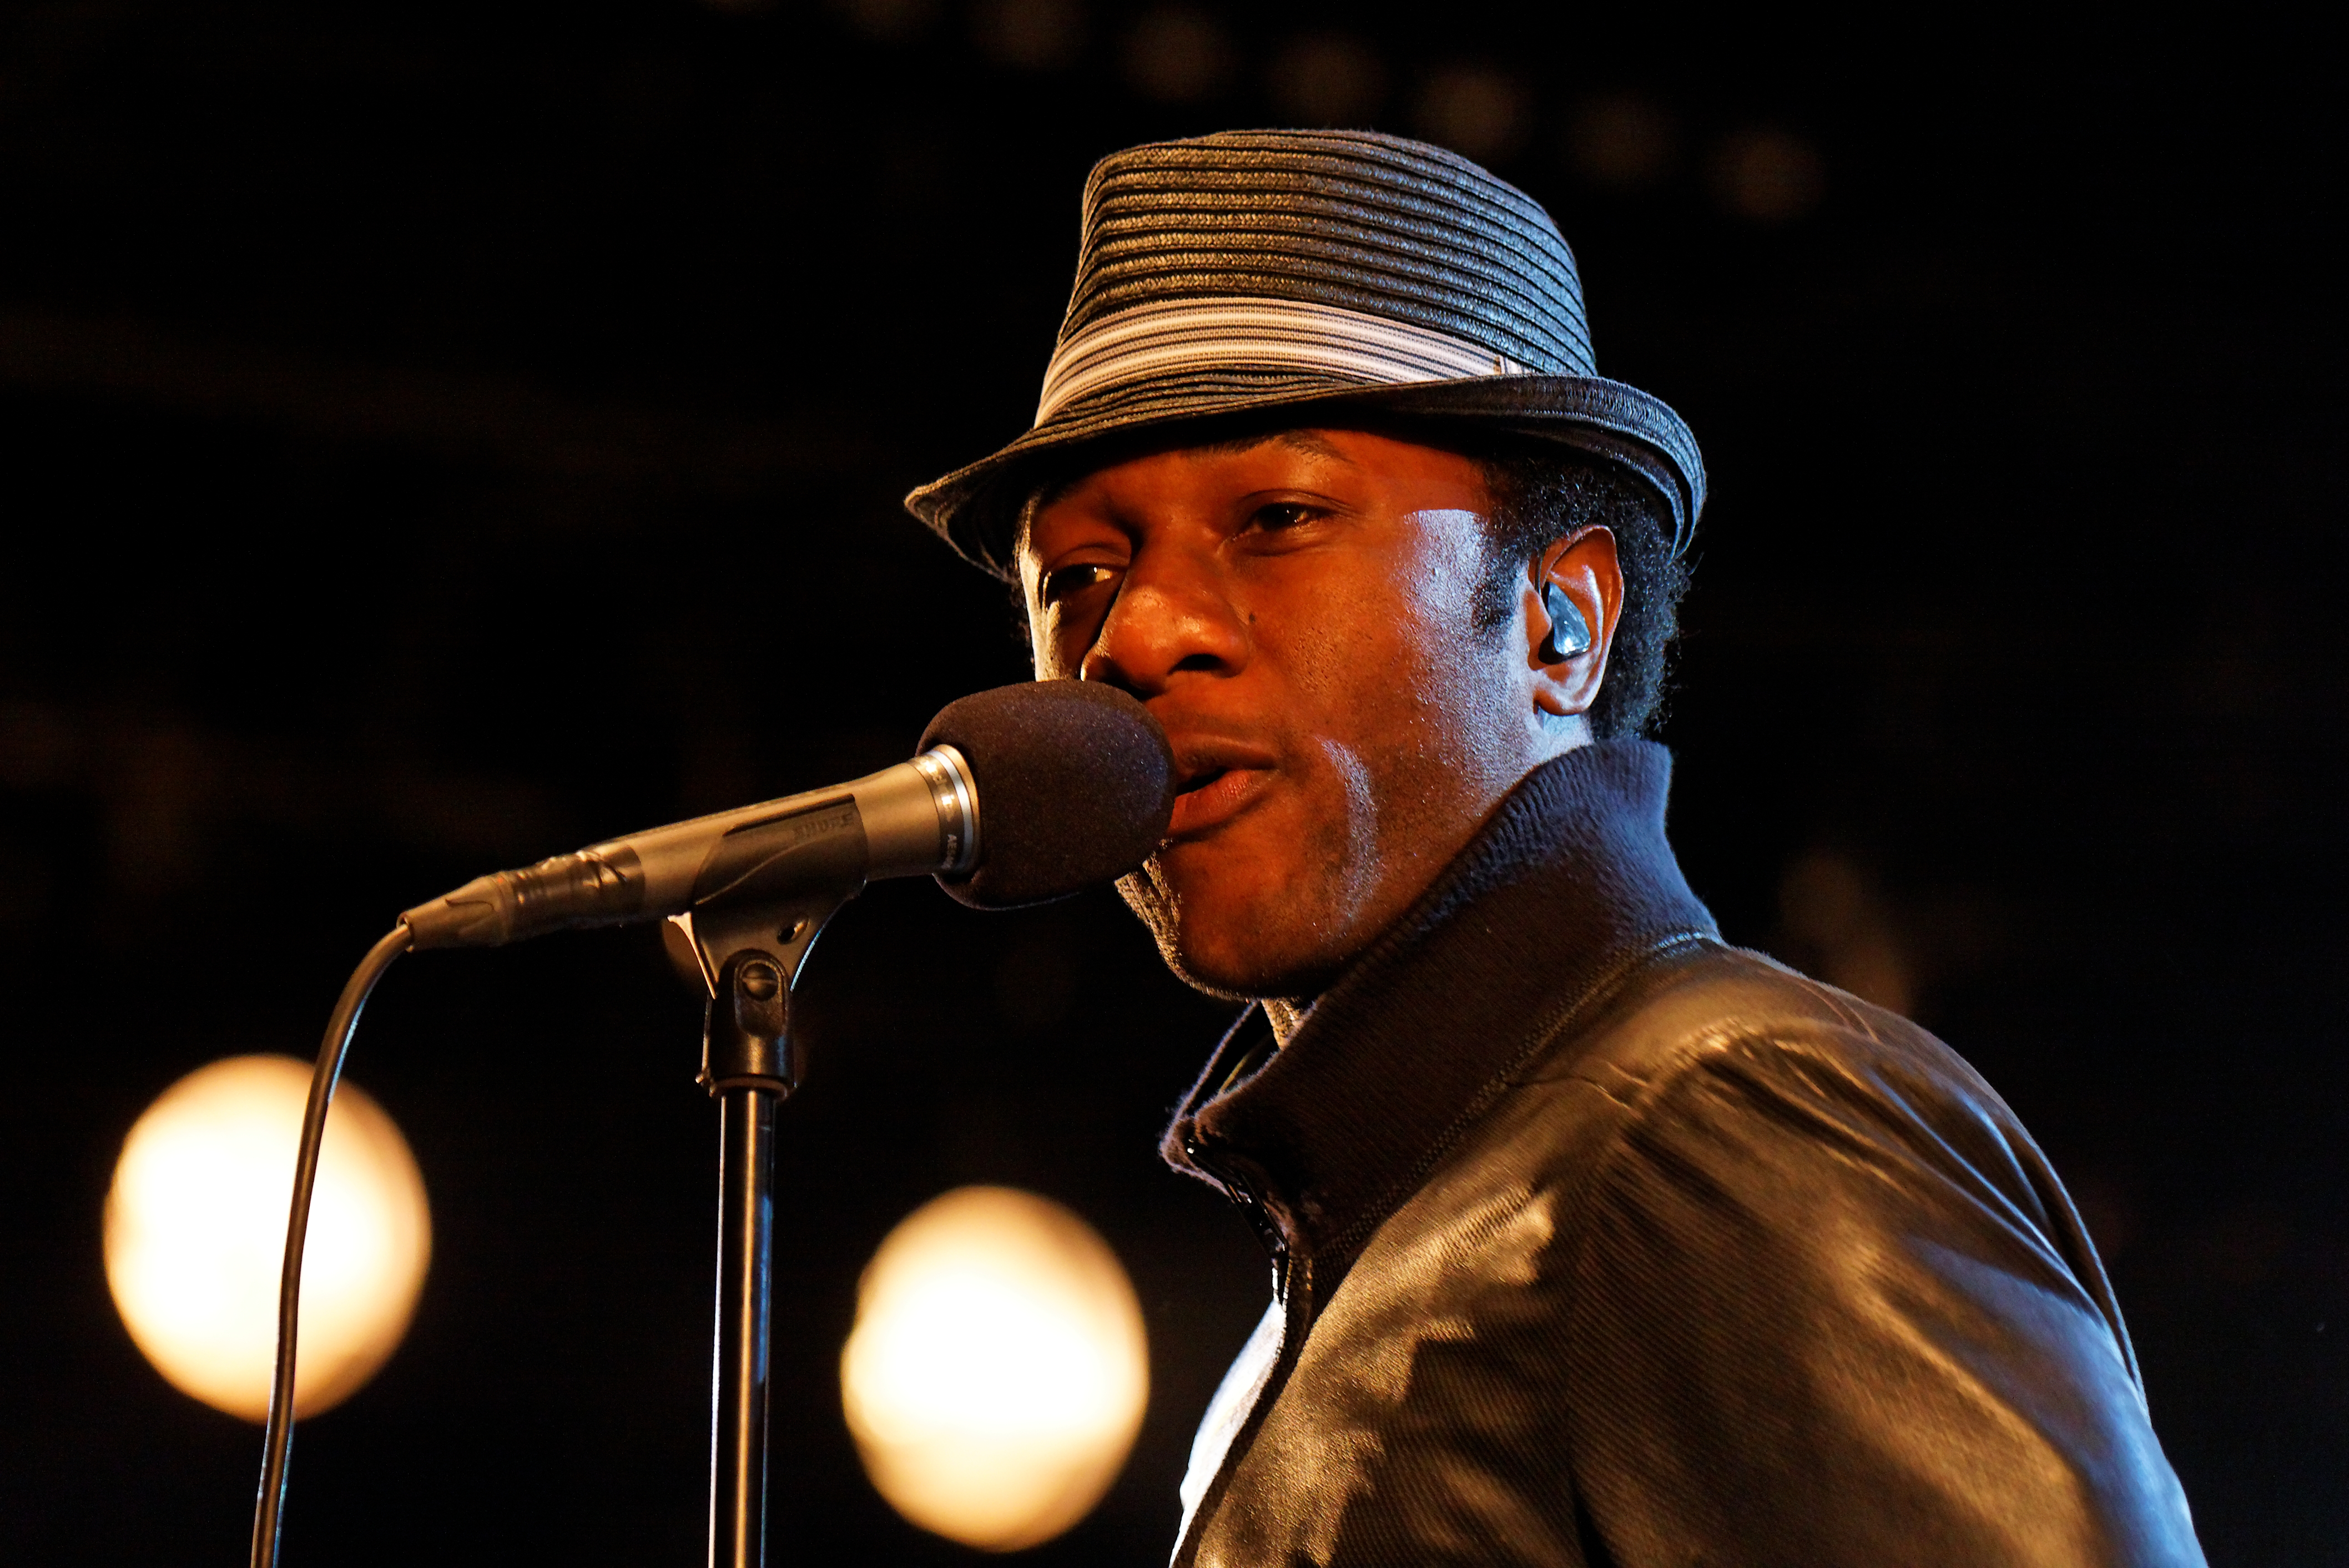 http://upload.wikimedia.org/wikipedia/commons/9/99/Festival_du_bout_du_Monde_2011_-_Aloe_Blacc_en_concert_le_6_ao%C3%BBt-_003.jpg